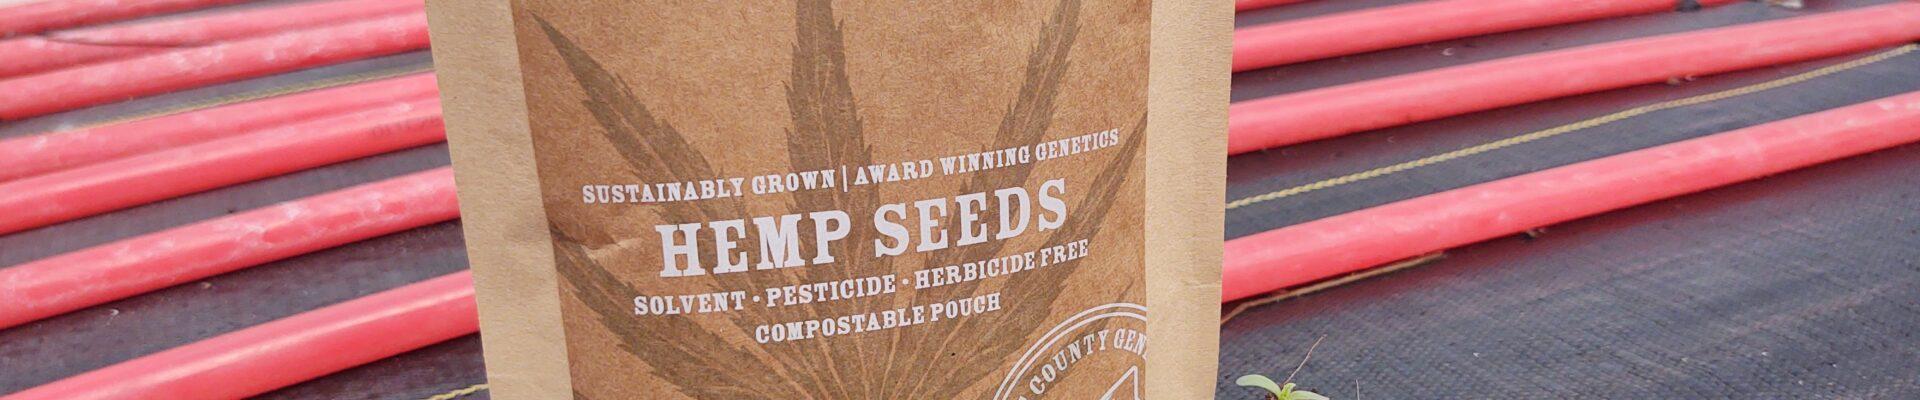 Charlotte Q Fem. Hemp Seed